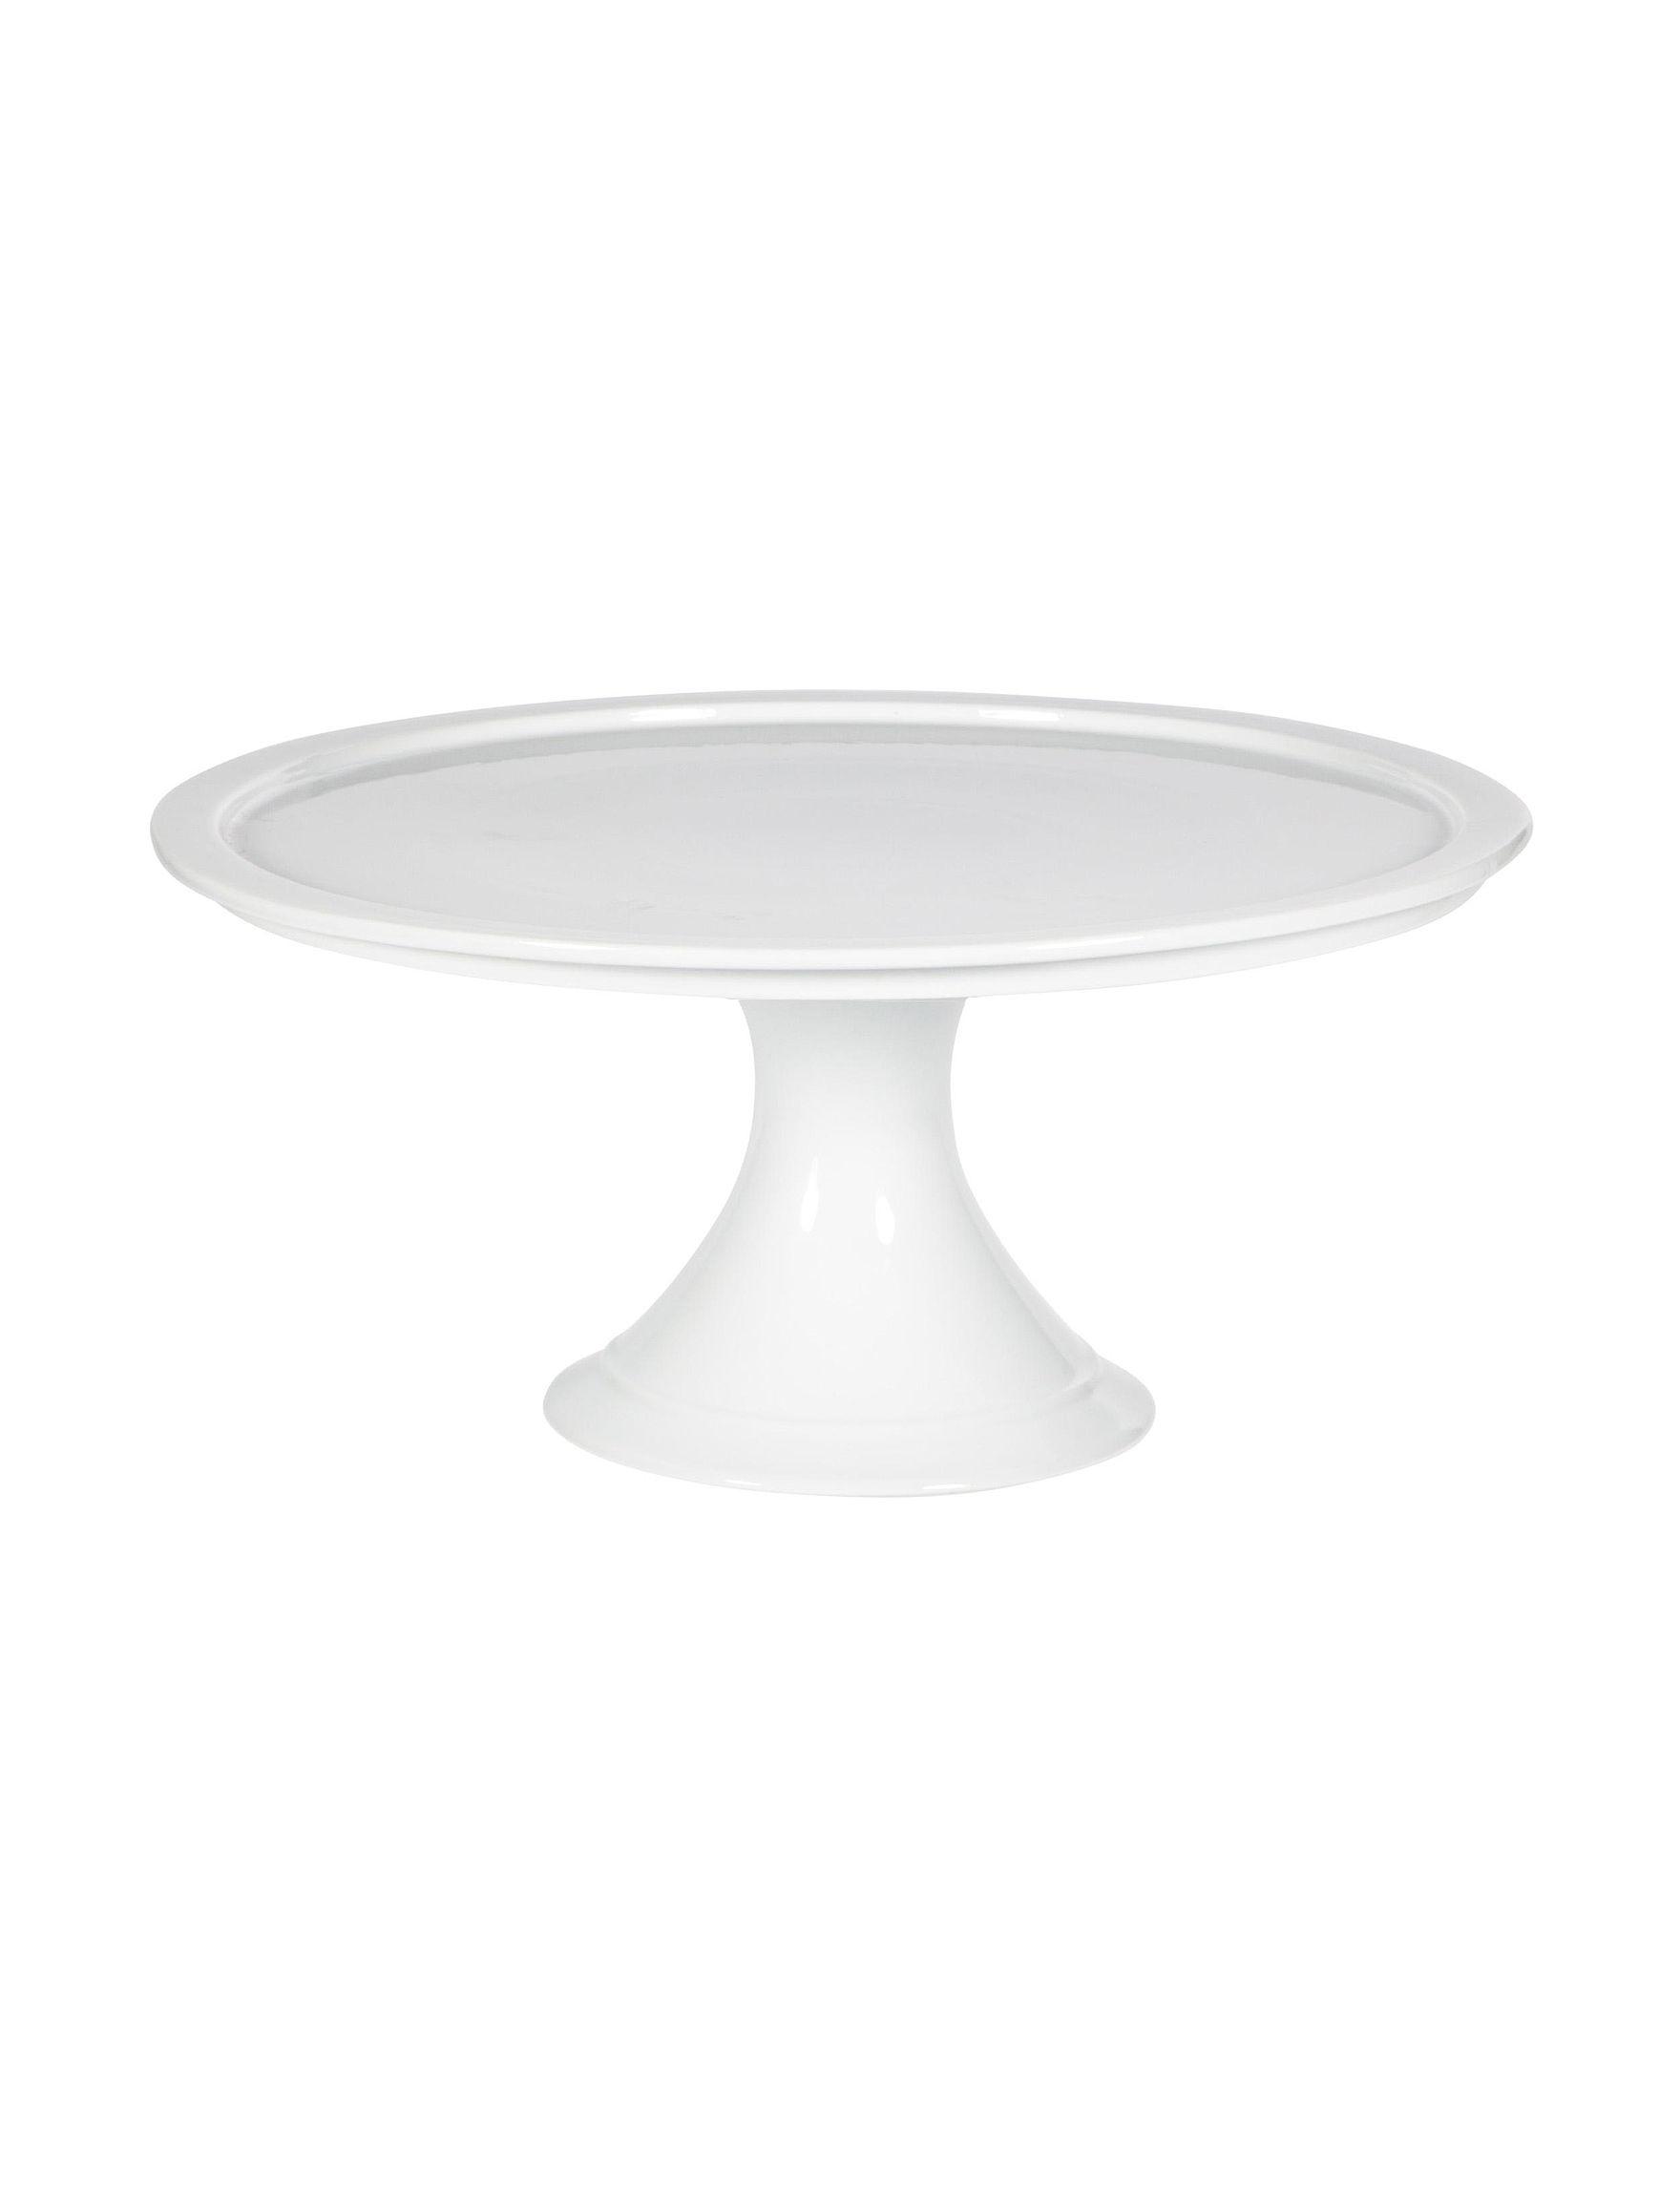 Home Essentials White / Silver Cake Stands & Tiered Servers Serveware